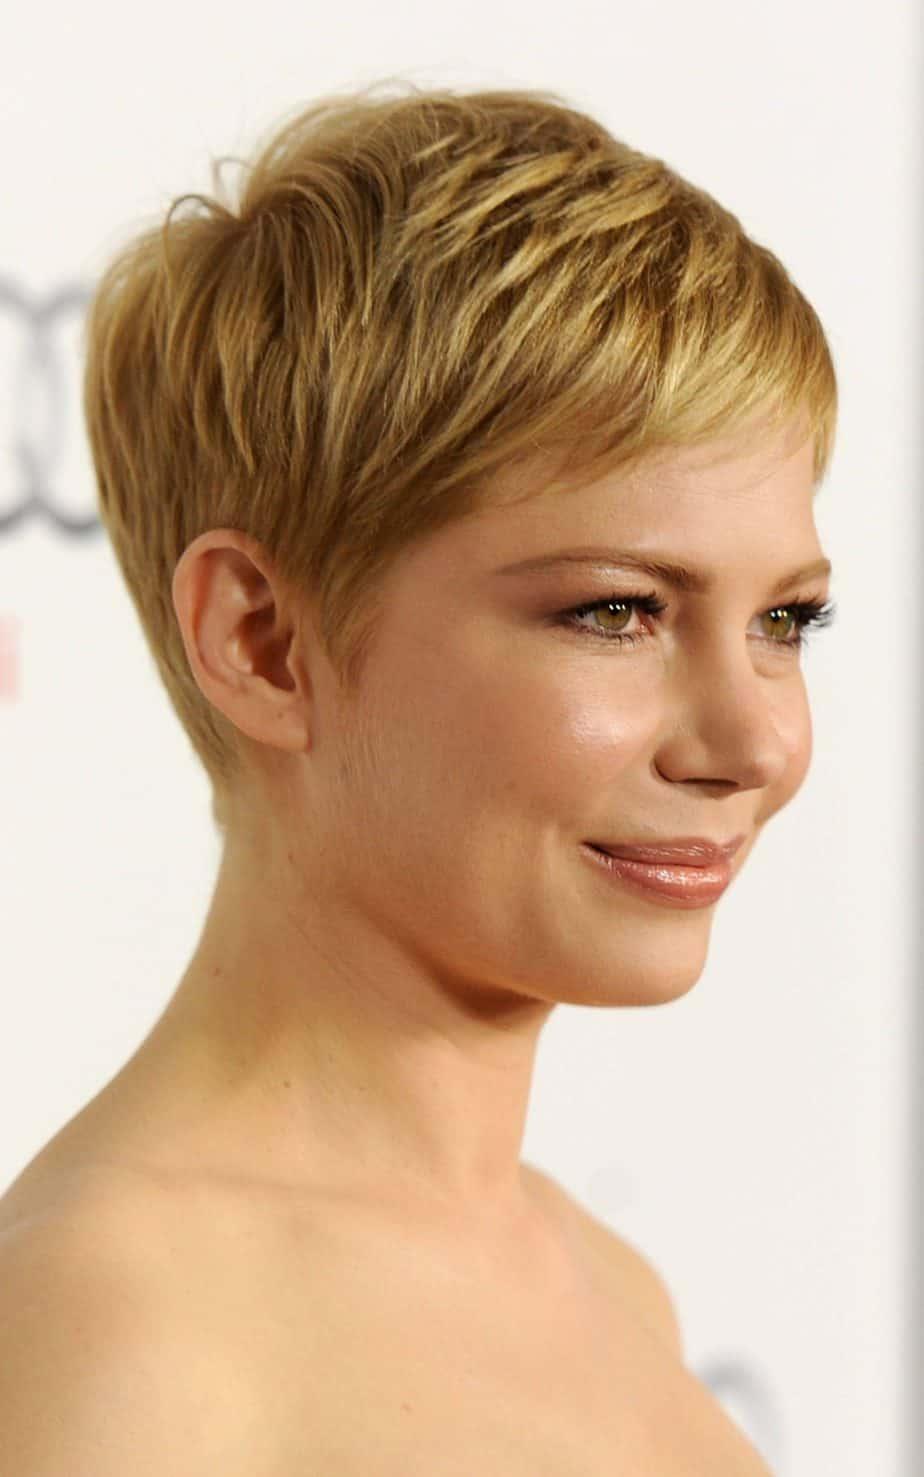 Best Women Short Hairstyles 2021 Modern Pixie Cut